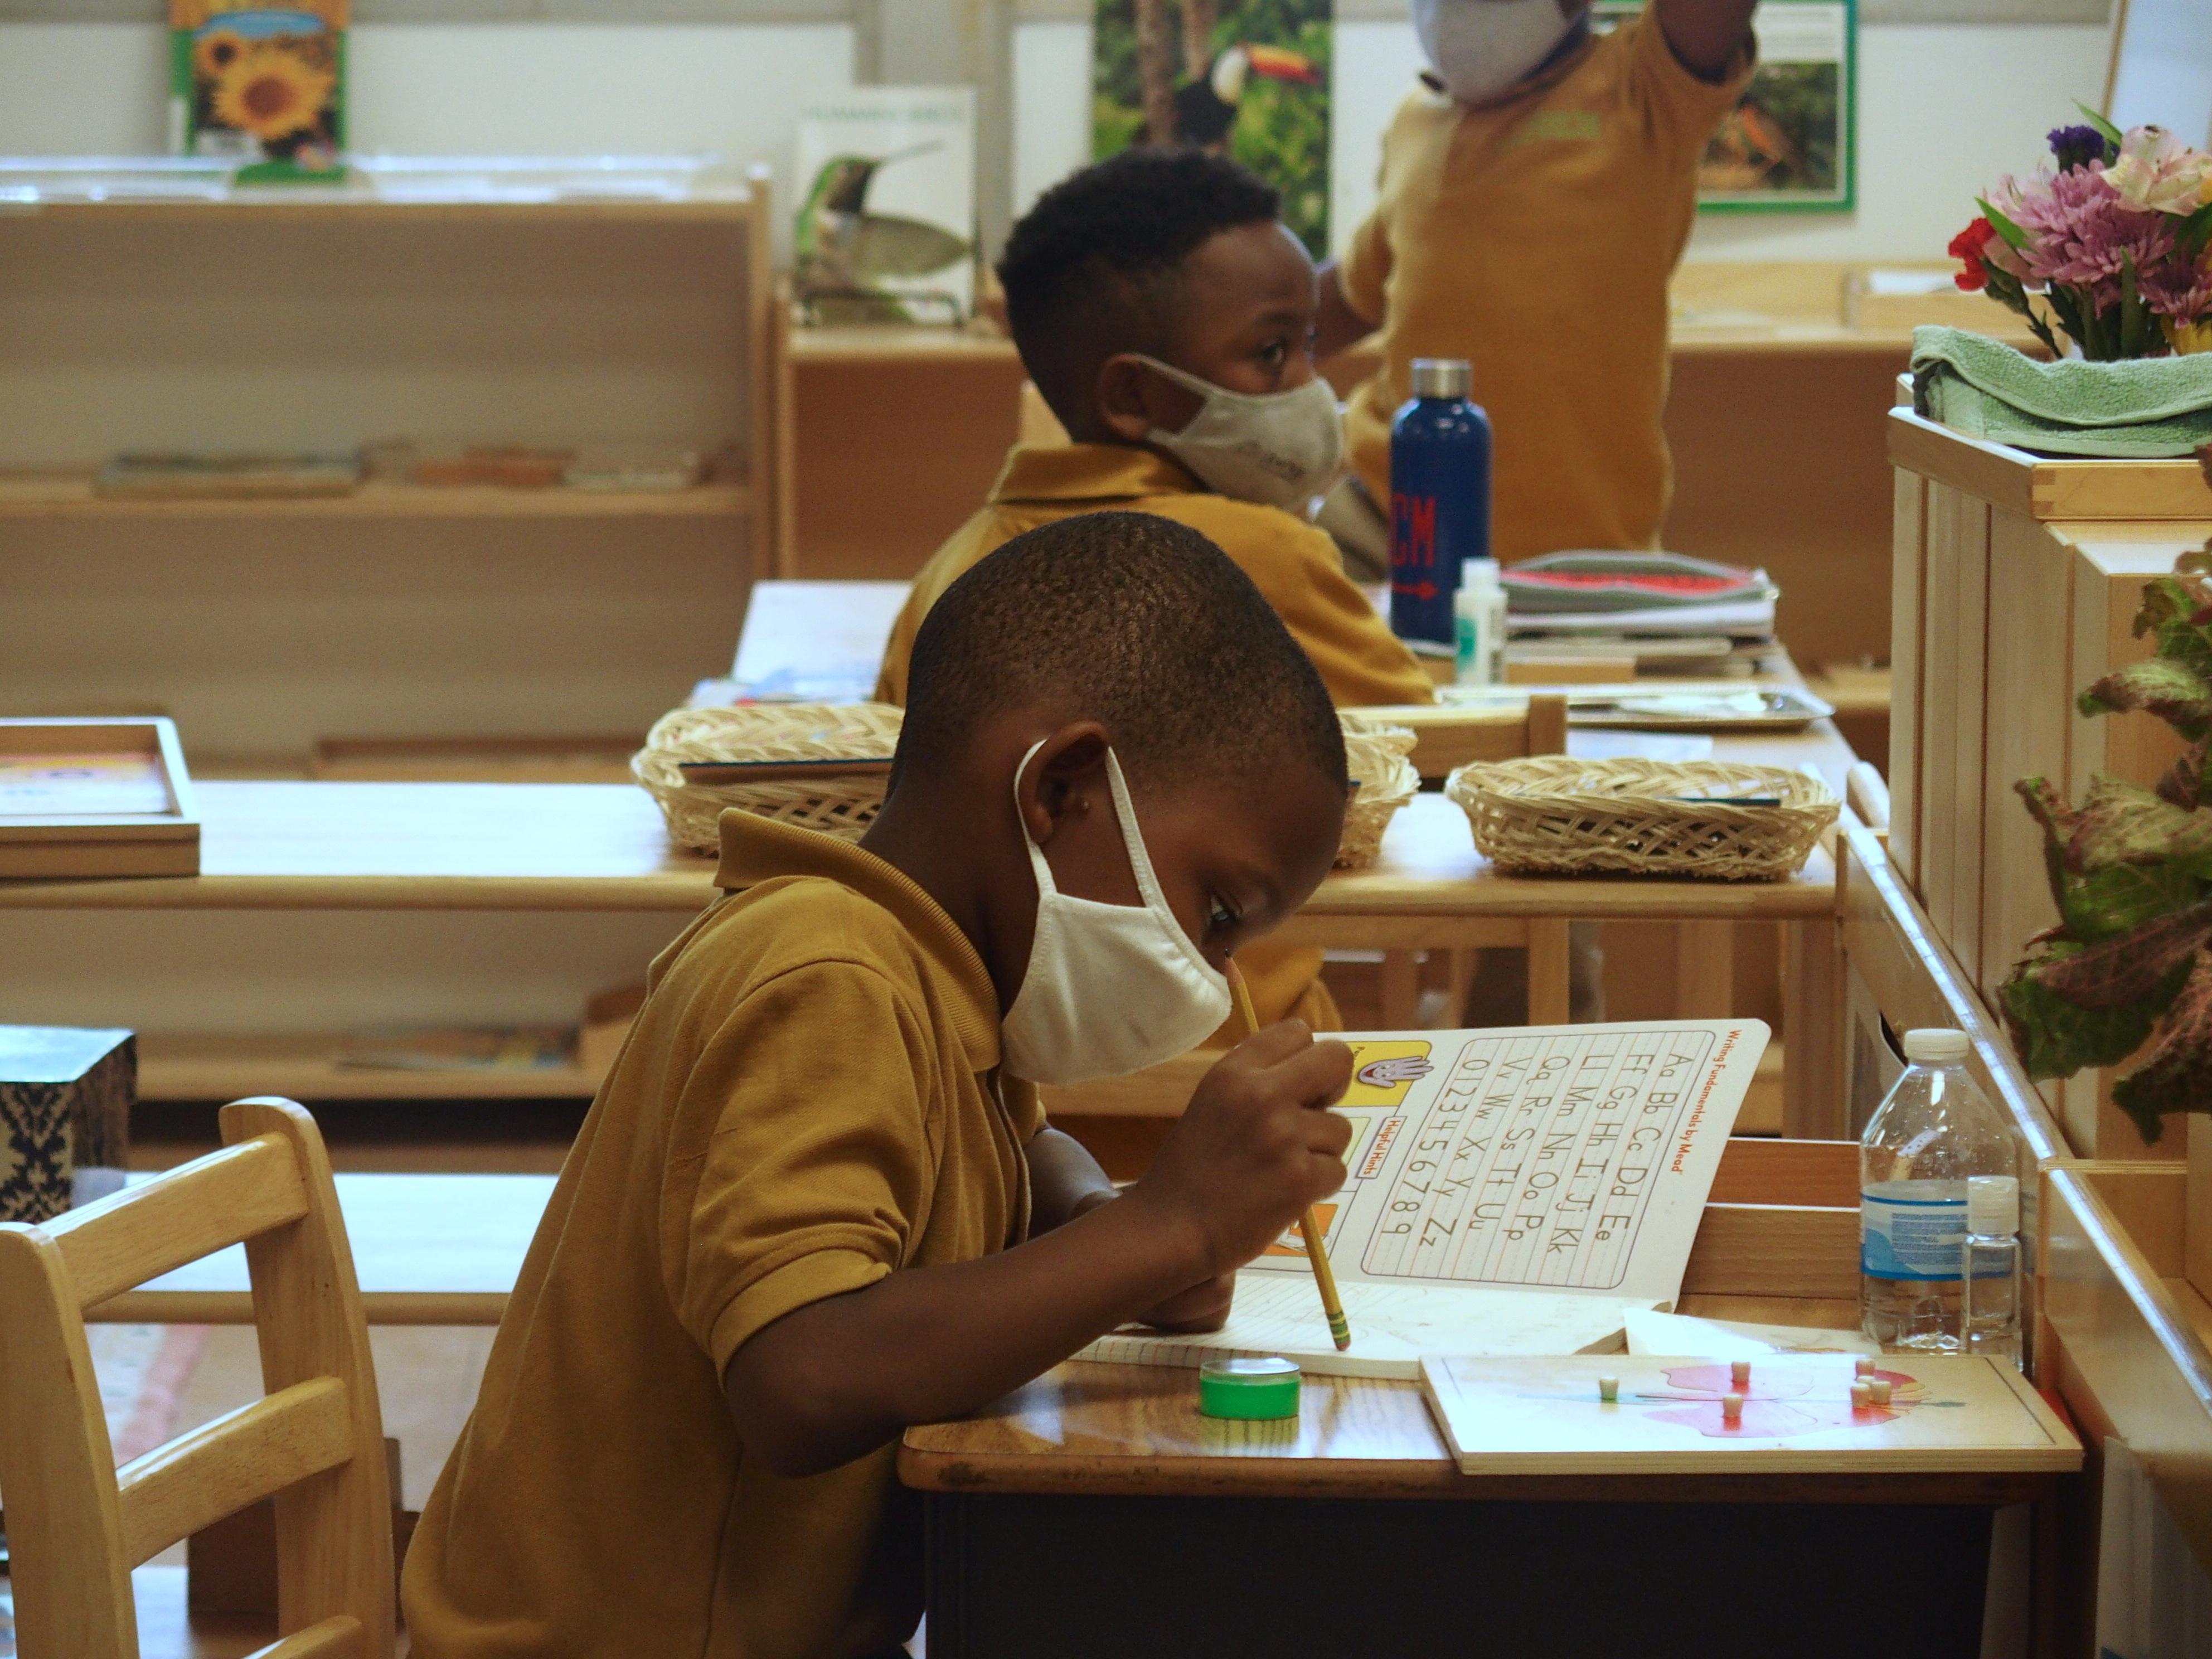 Elementary school students in masks work at their desks